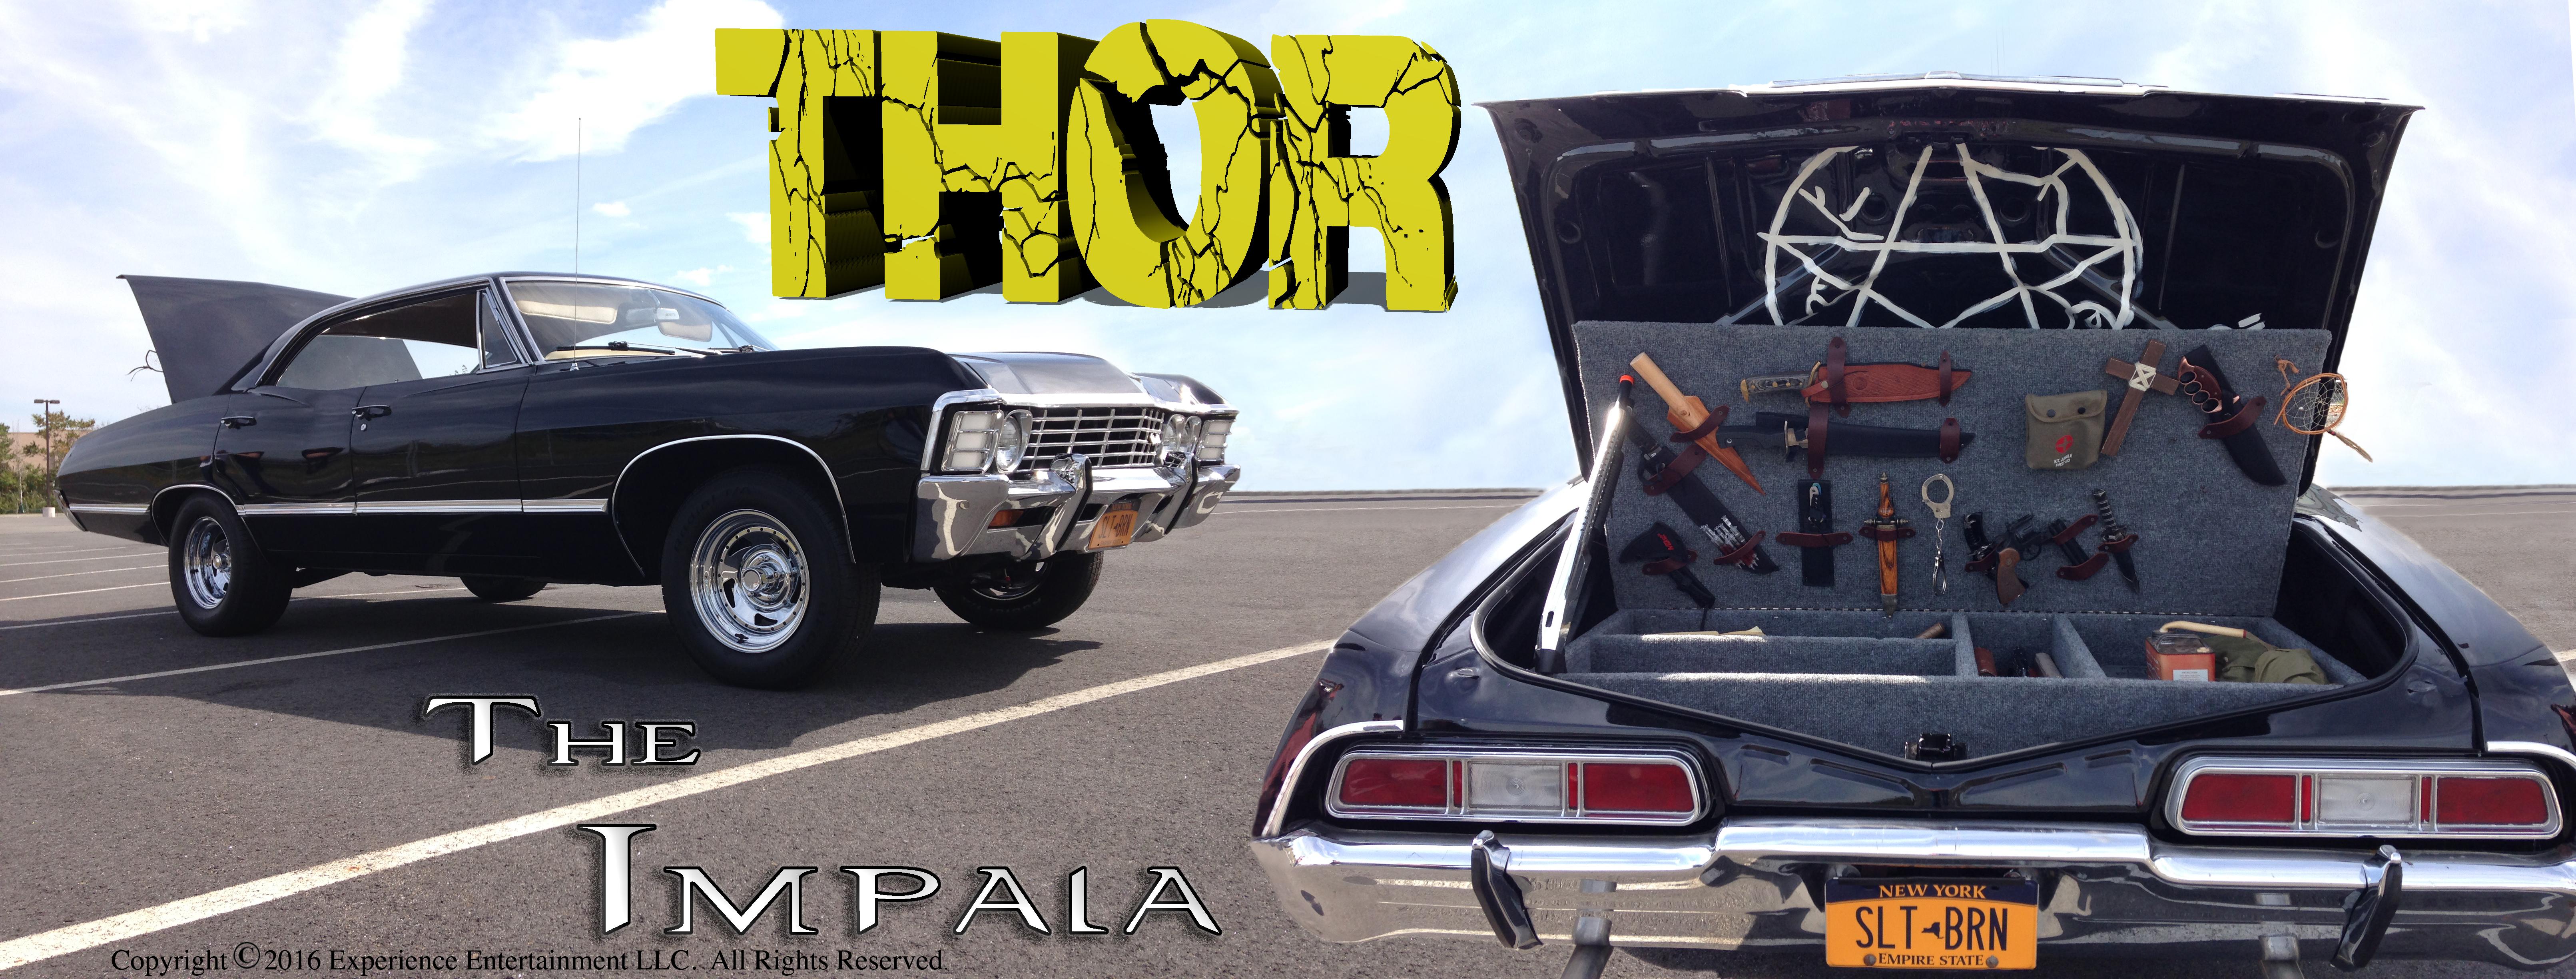 impalaspreadlite